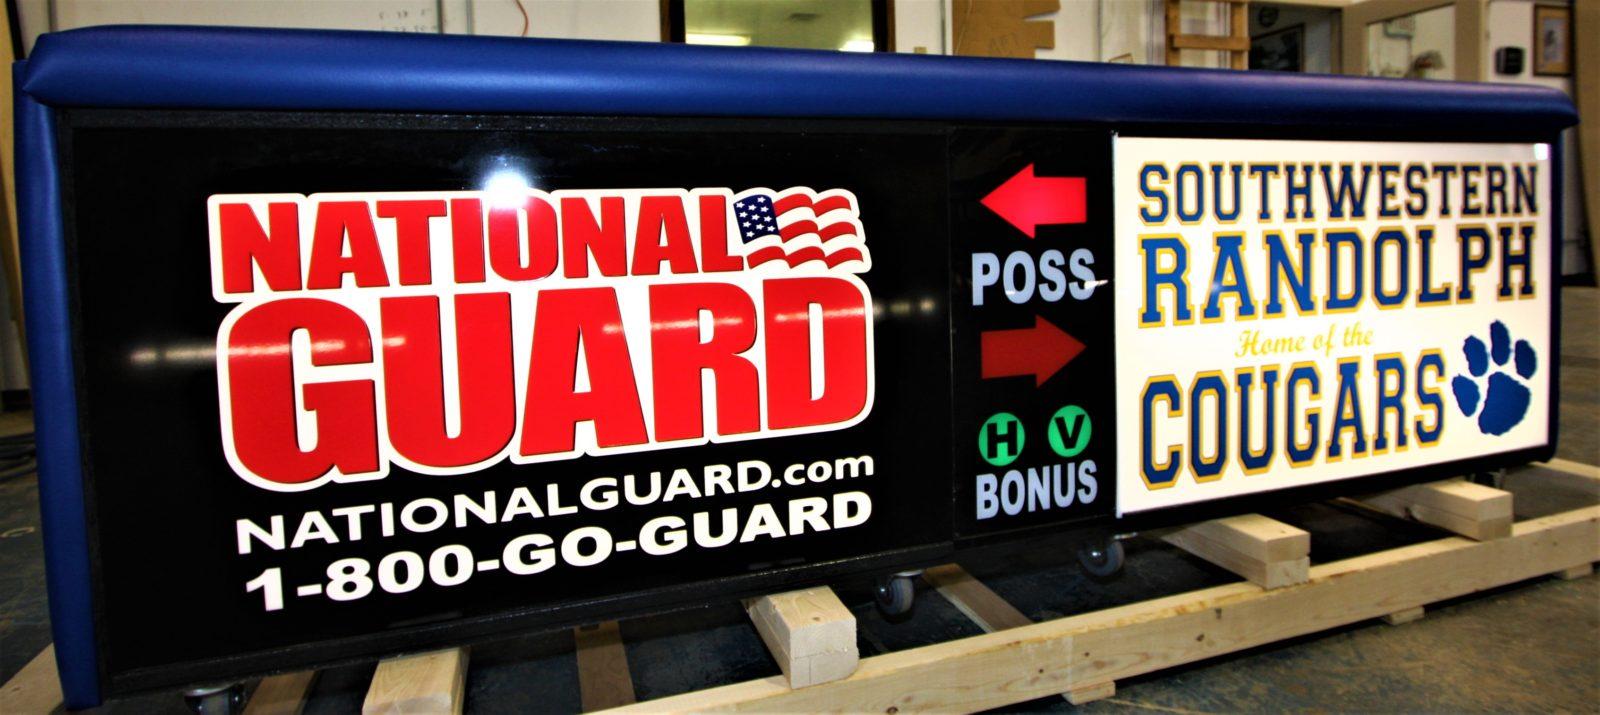 Southwestern high school scoring table North Carolina Army National Guard NCARNG